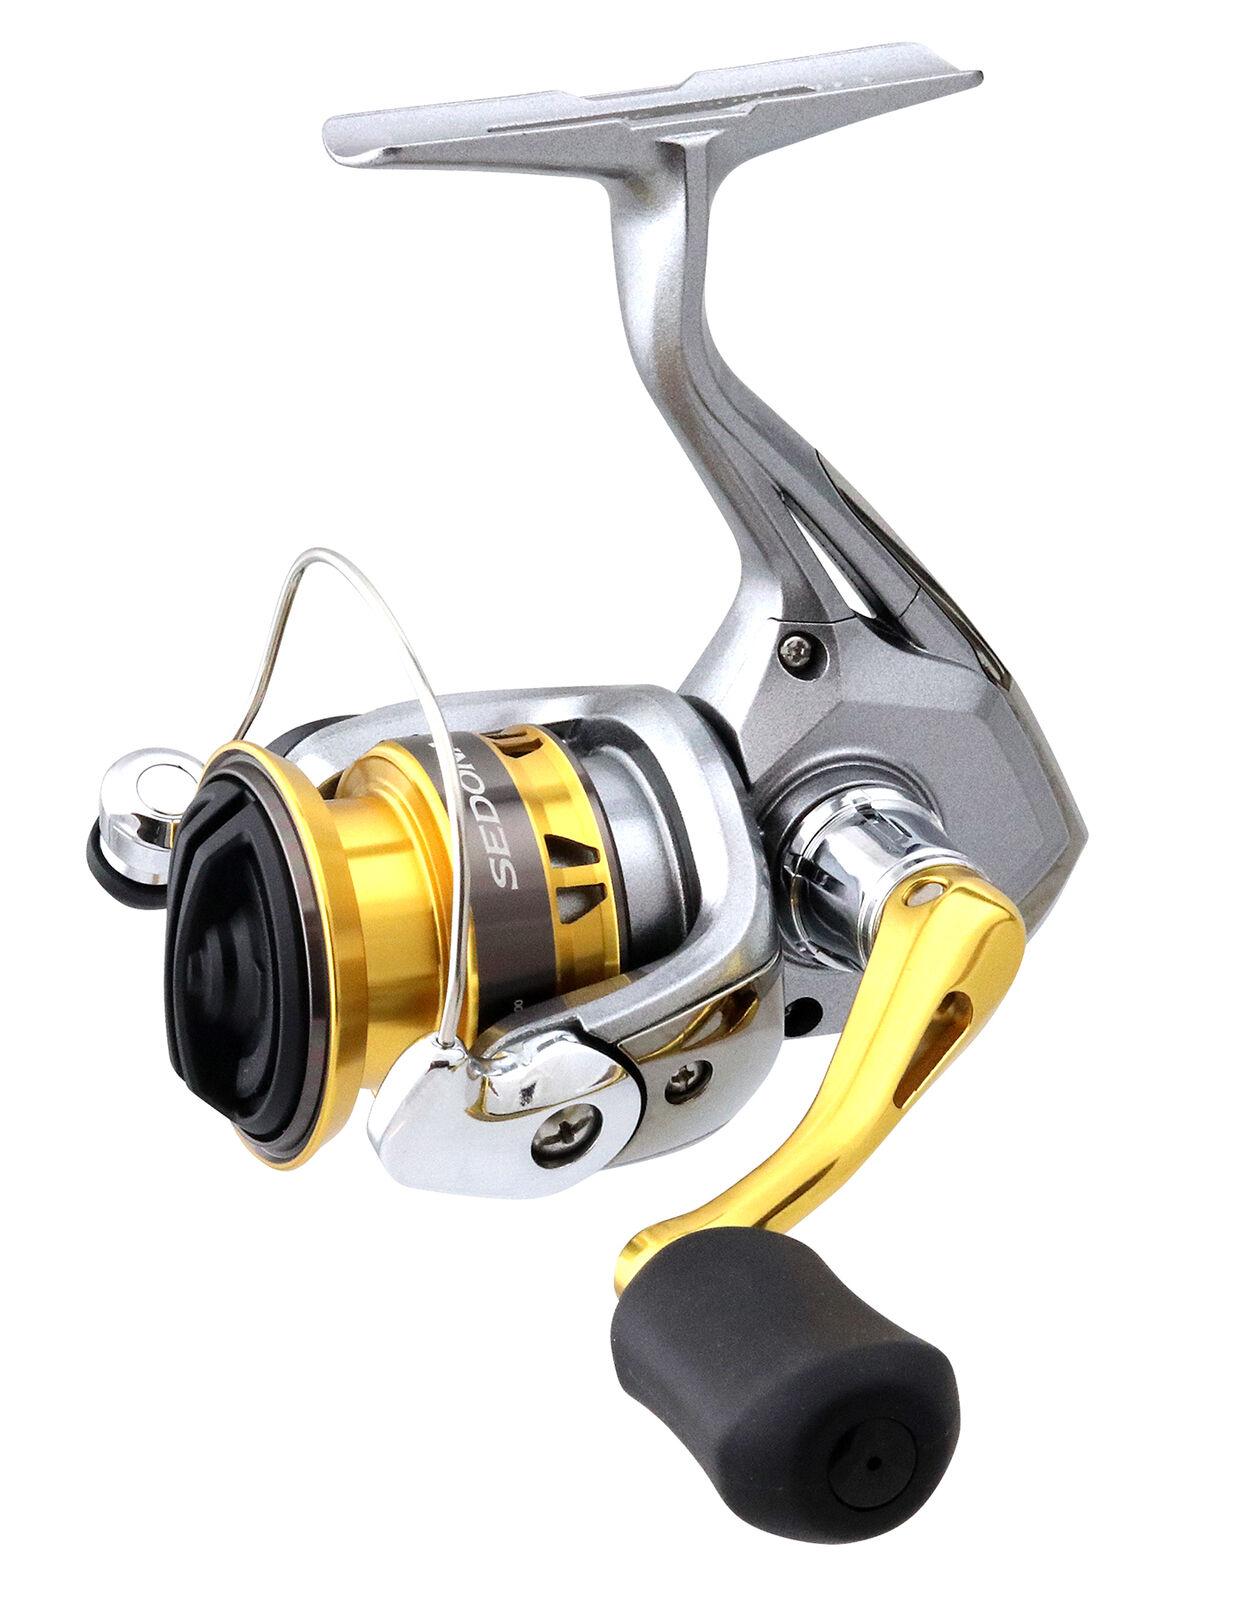 Shimano Sedona FI Spinning Reels - Bass, Trout,  Redfish, Striper, & Panfish Reel  promotional items